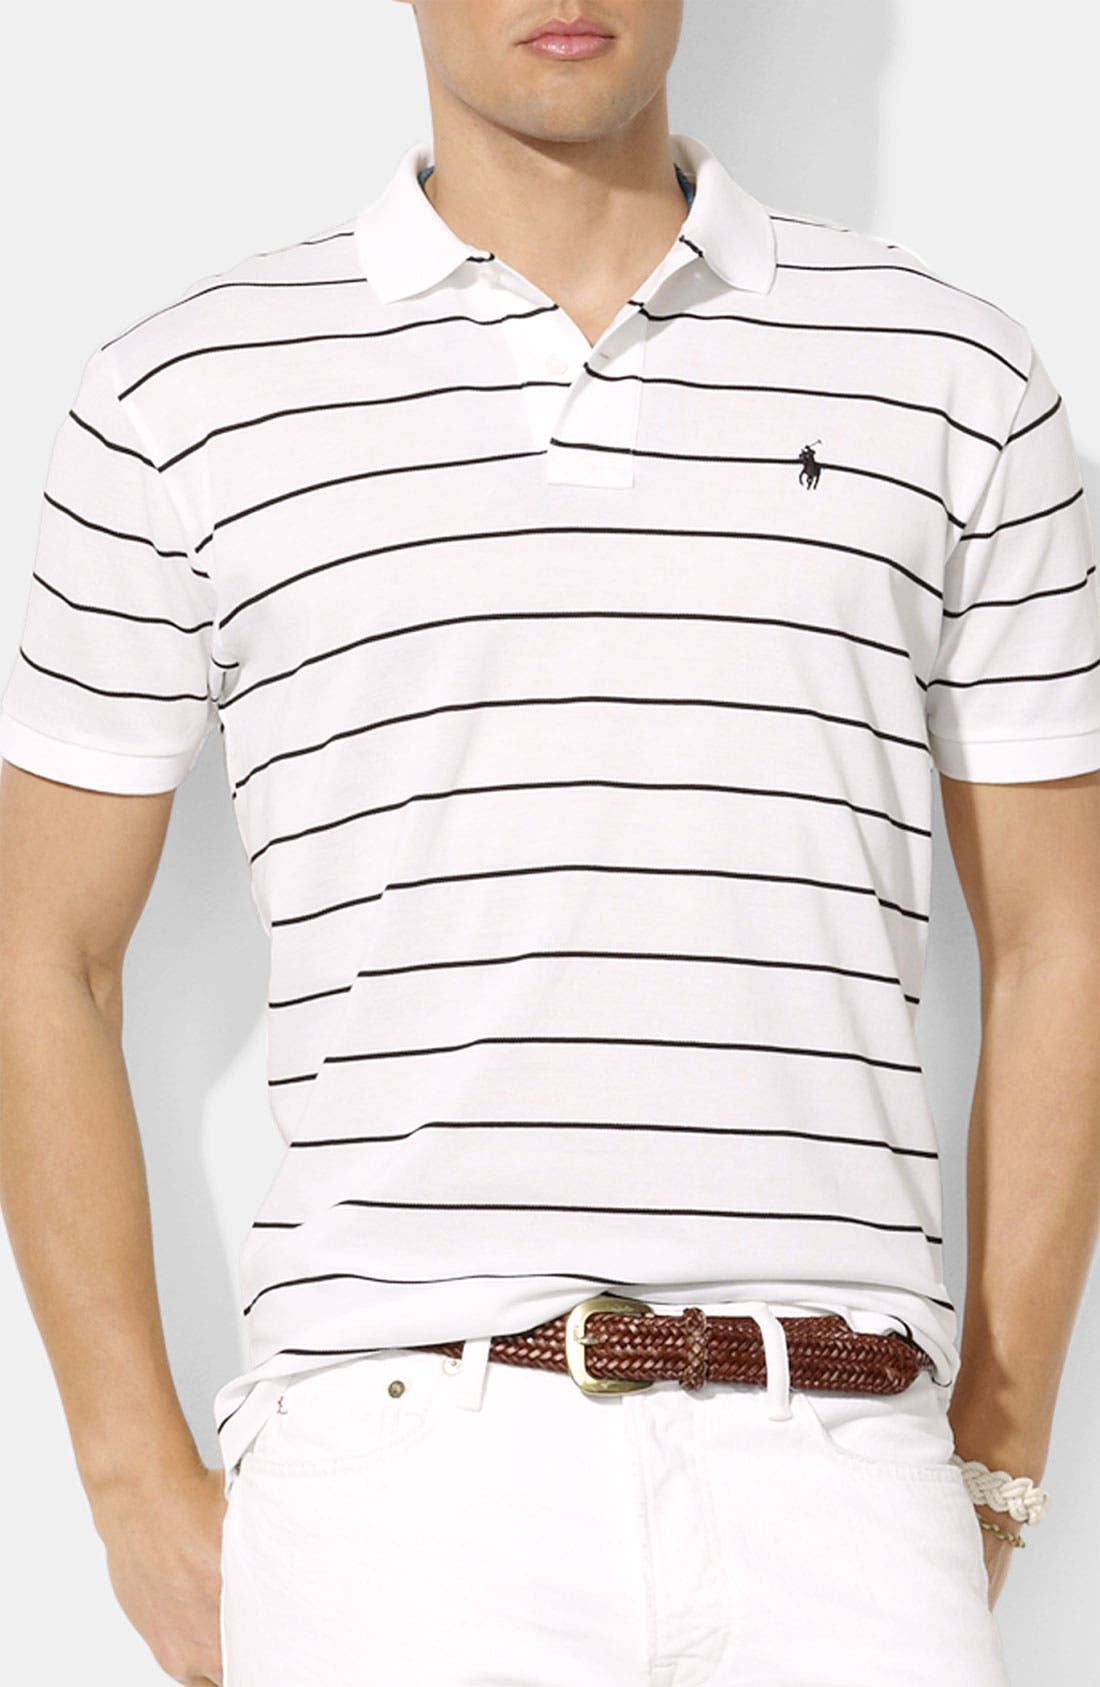 Alternate Image 1 Selected - Polo Ralph Lauren Classic Fit Piqué Polo